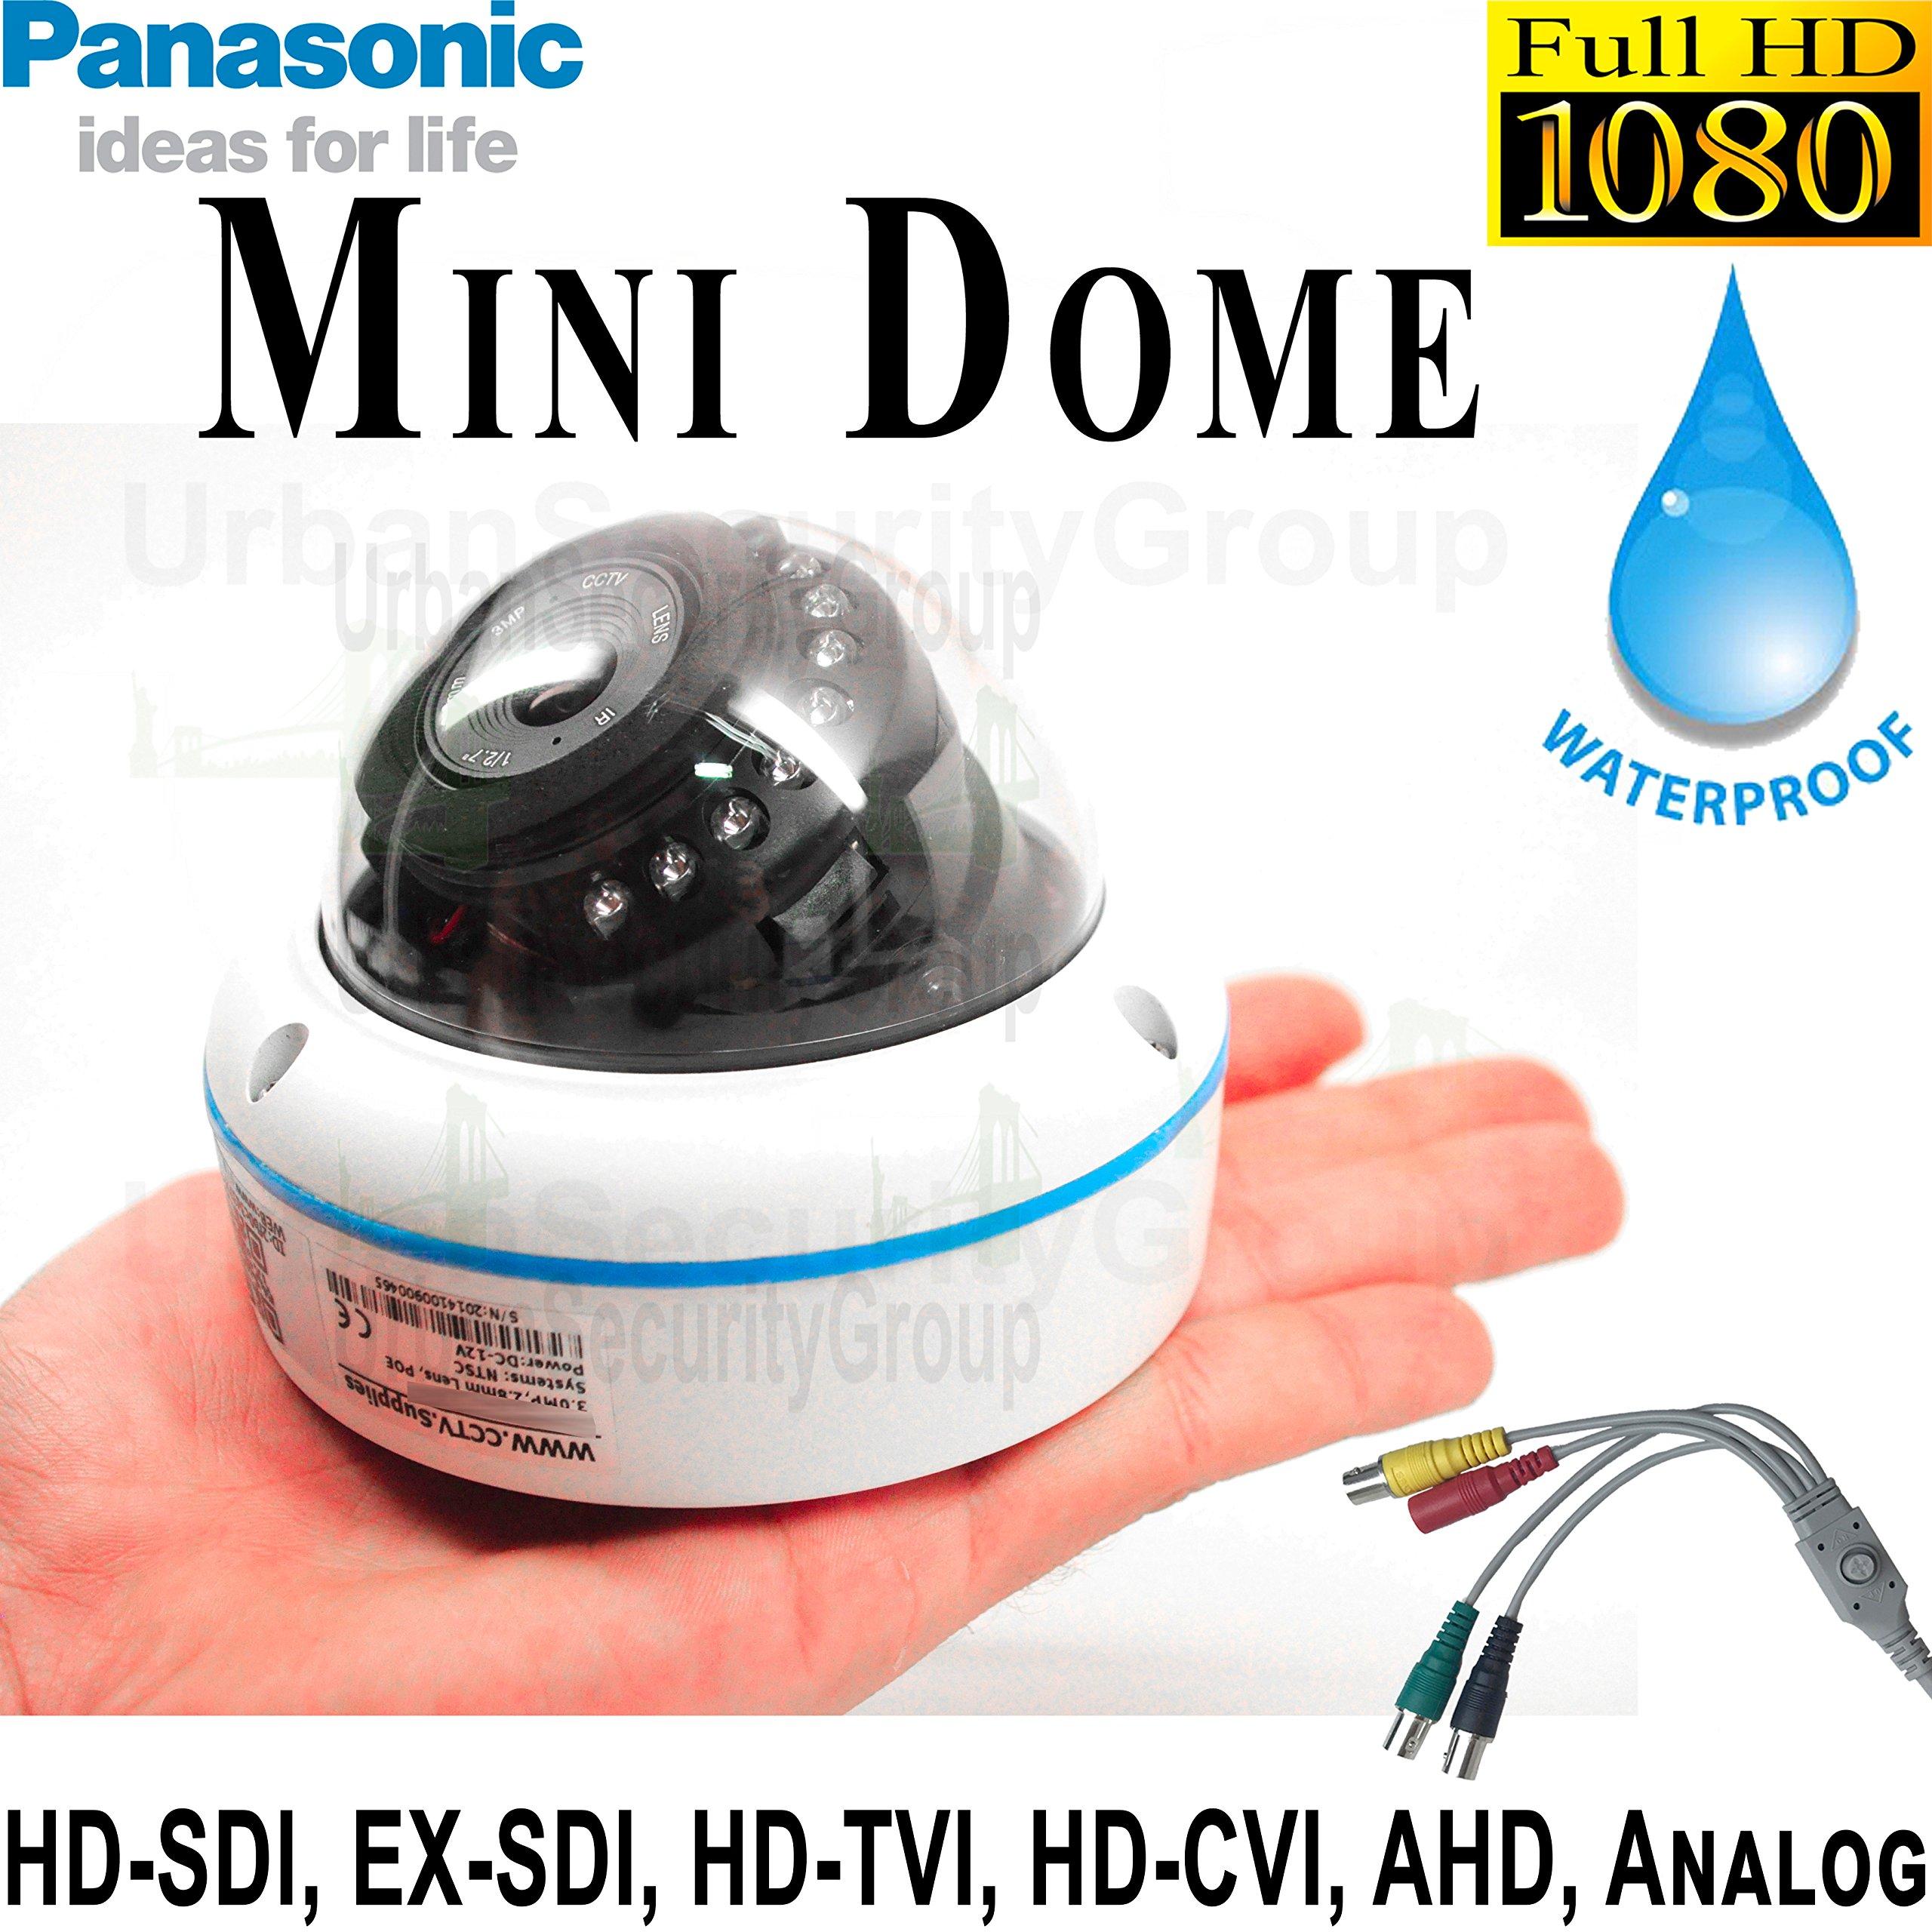 USG 6-in-1 CCTV Format Panasonic Chip 1080P 2MP High Definition Discreet Mini Dome Security Camera : 3.6mm Fixed Wide Angle Lens, 15x IR LEDs : HD-SDI, EX-SDI, HD-TVI, HD-CVI, AHD, Analog Format